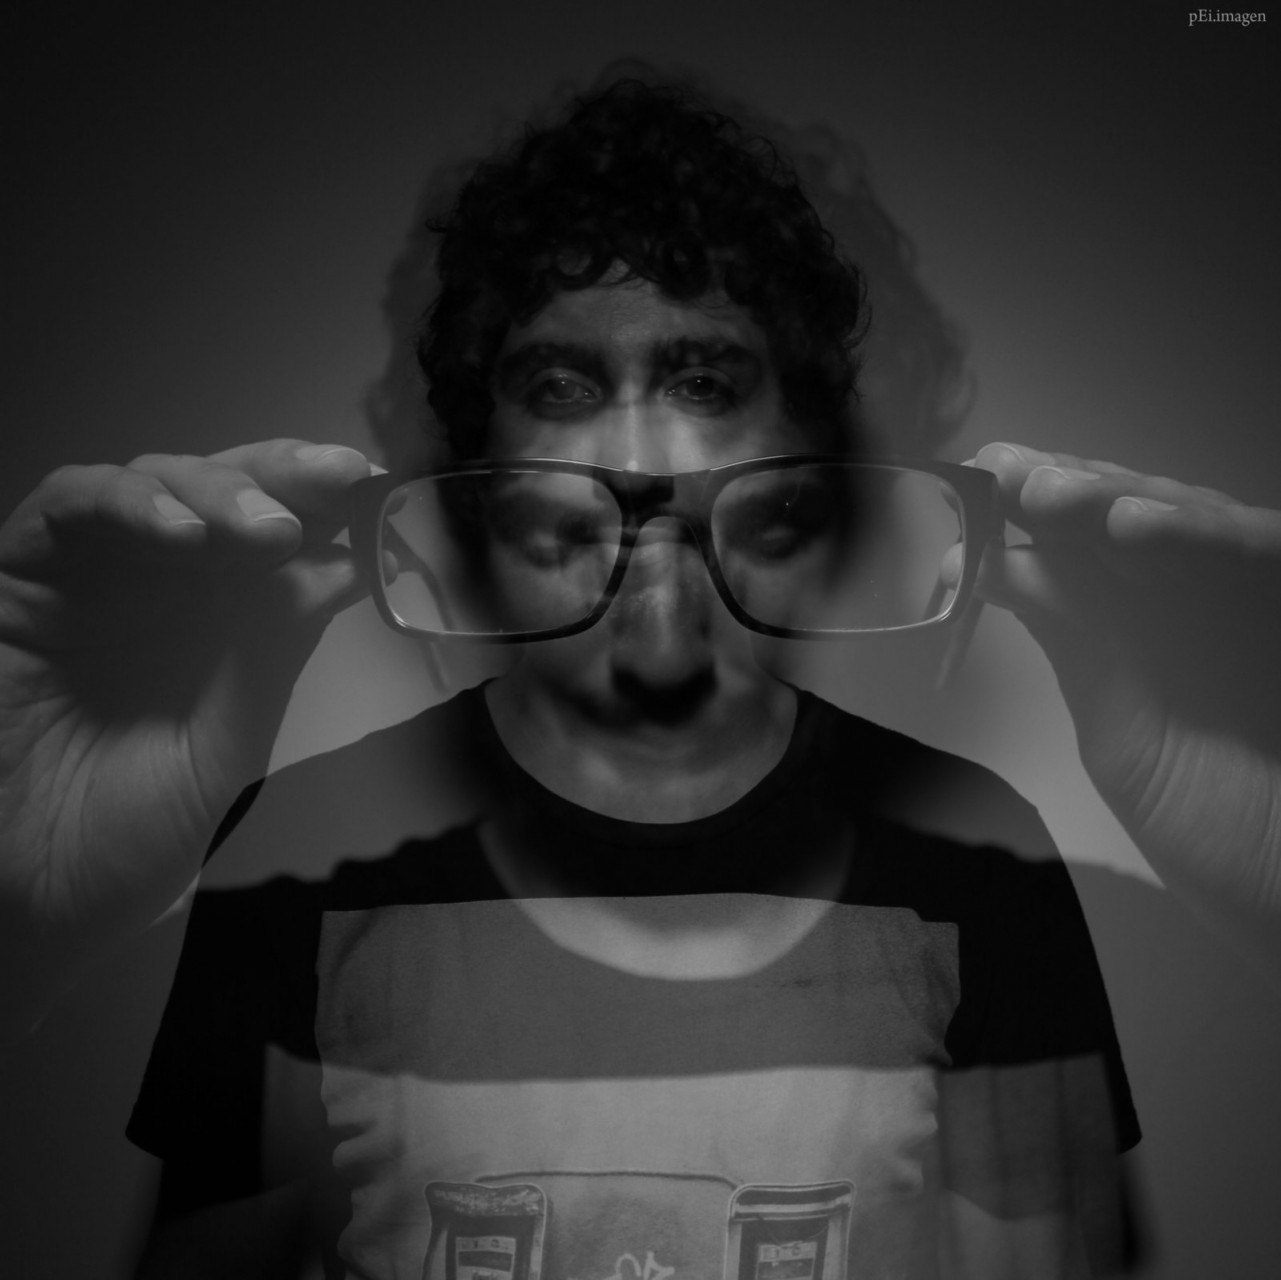 peipegata me myself I proyectos fotografia peipegatafotografia # 100 Francesco Di Camilo